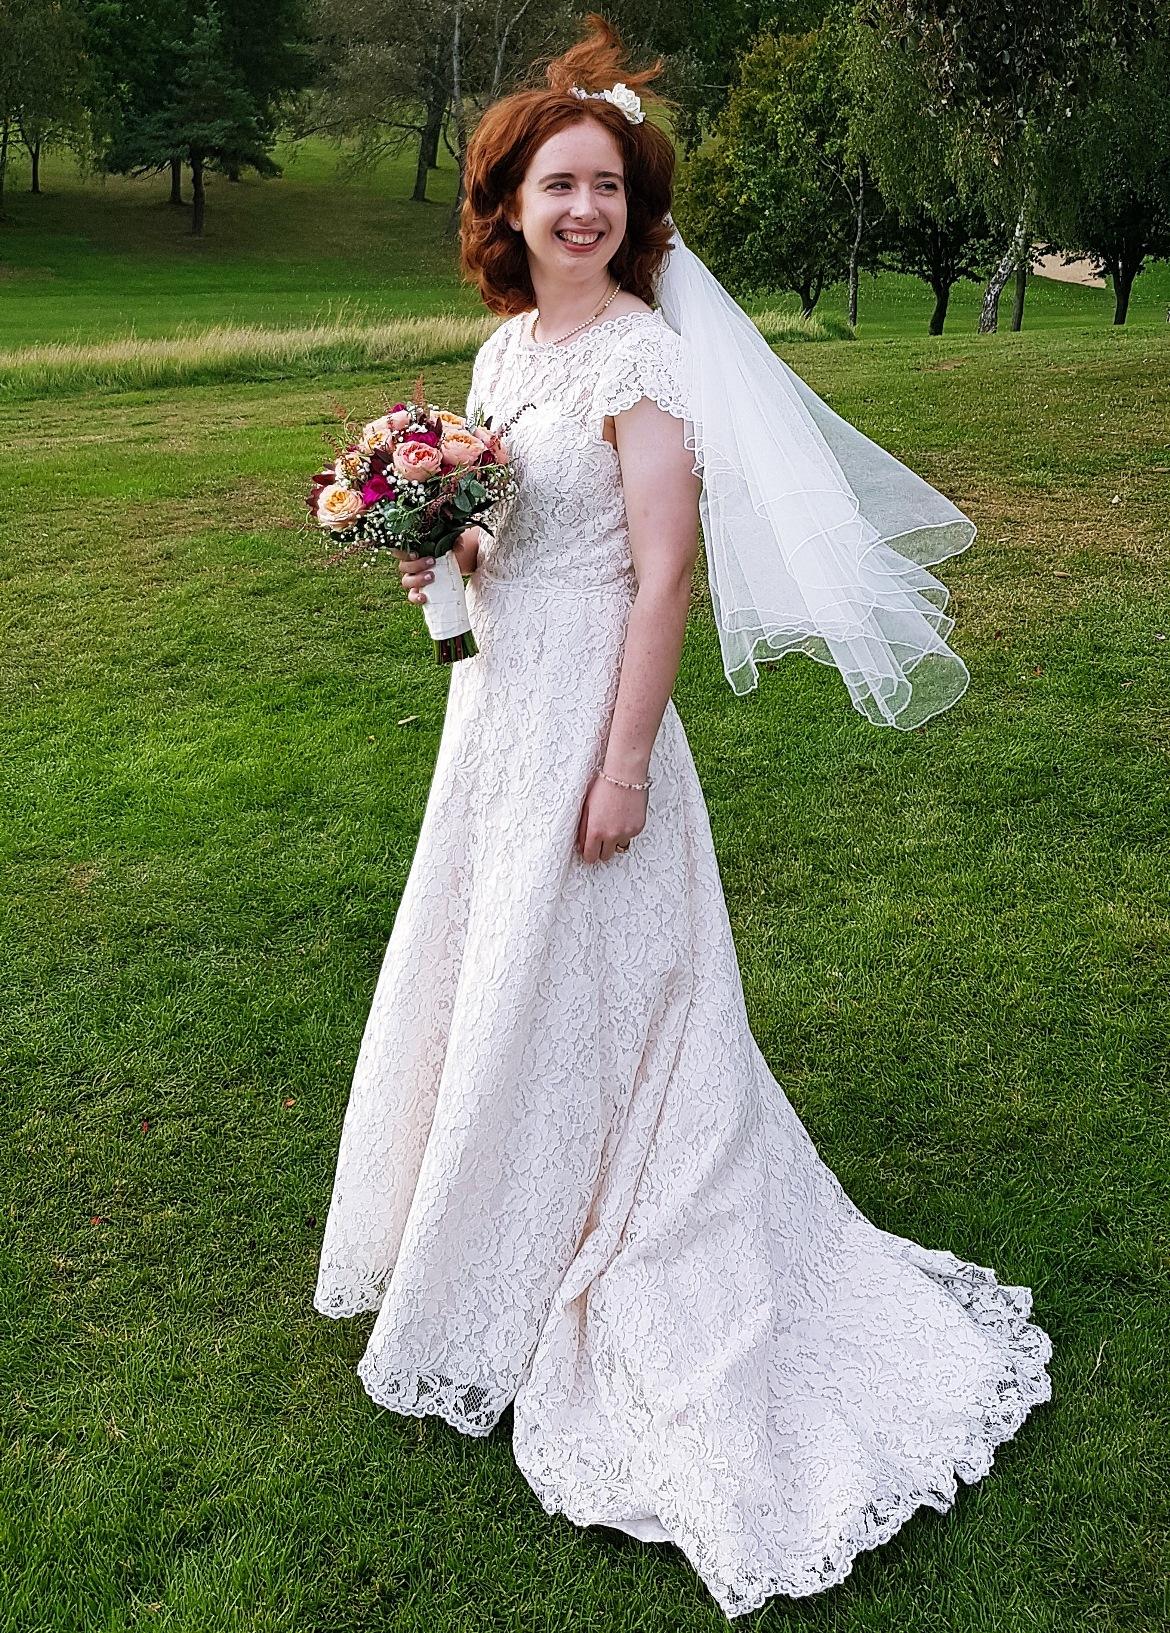 Caroline and Dan's wedding - September 2018 Monthly Recap by BeckyBecky Blogs